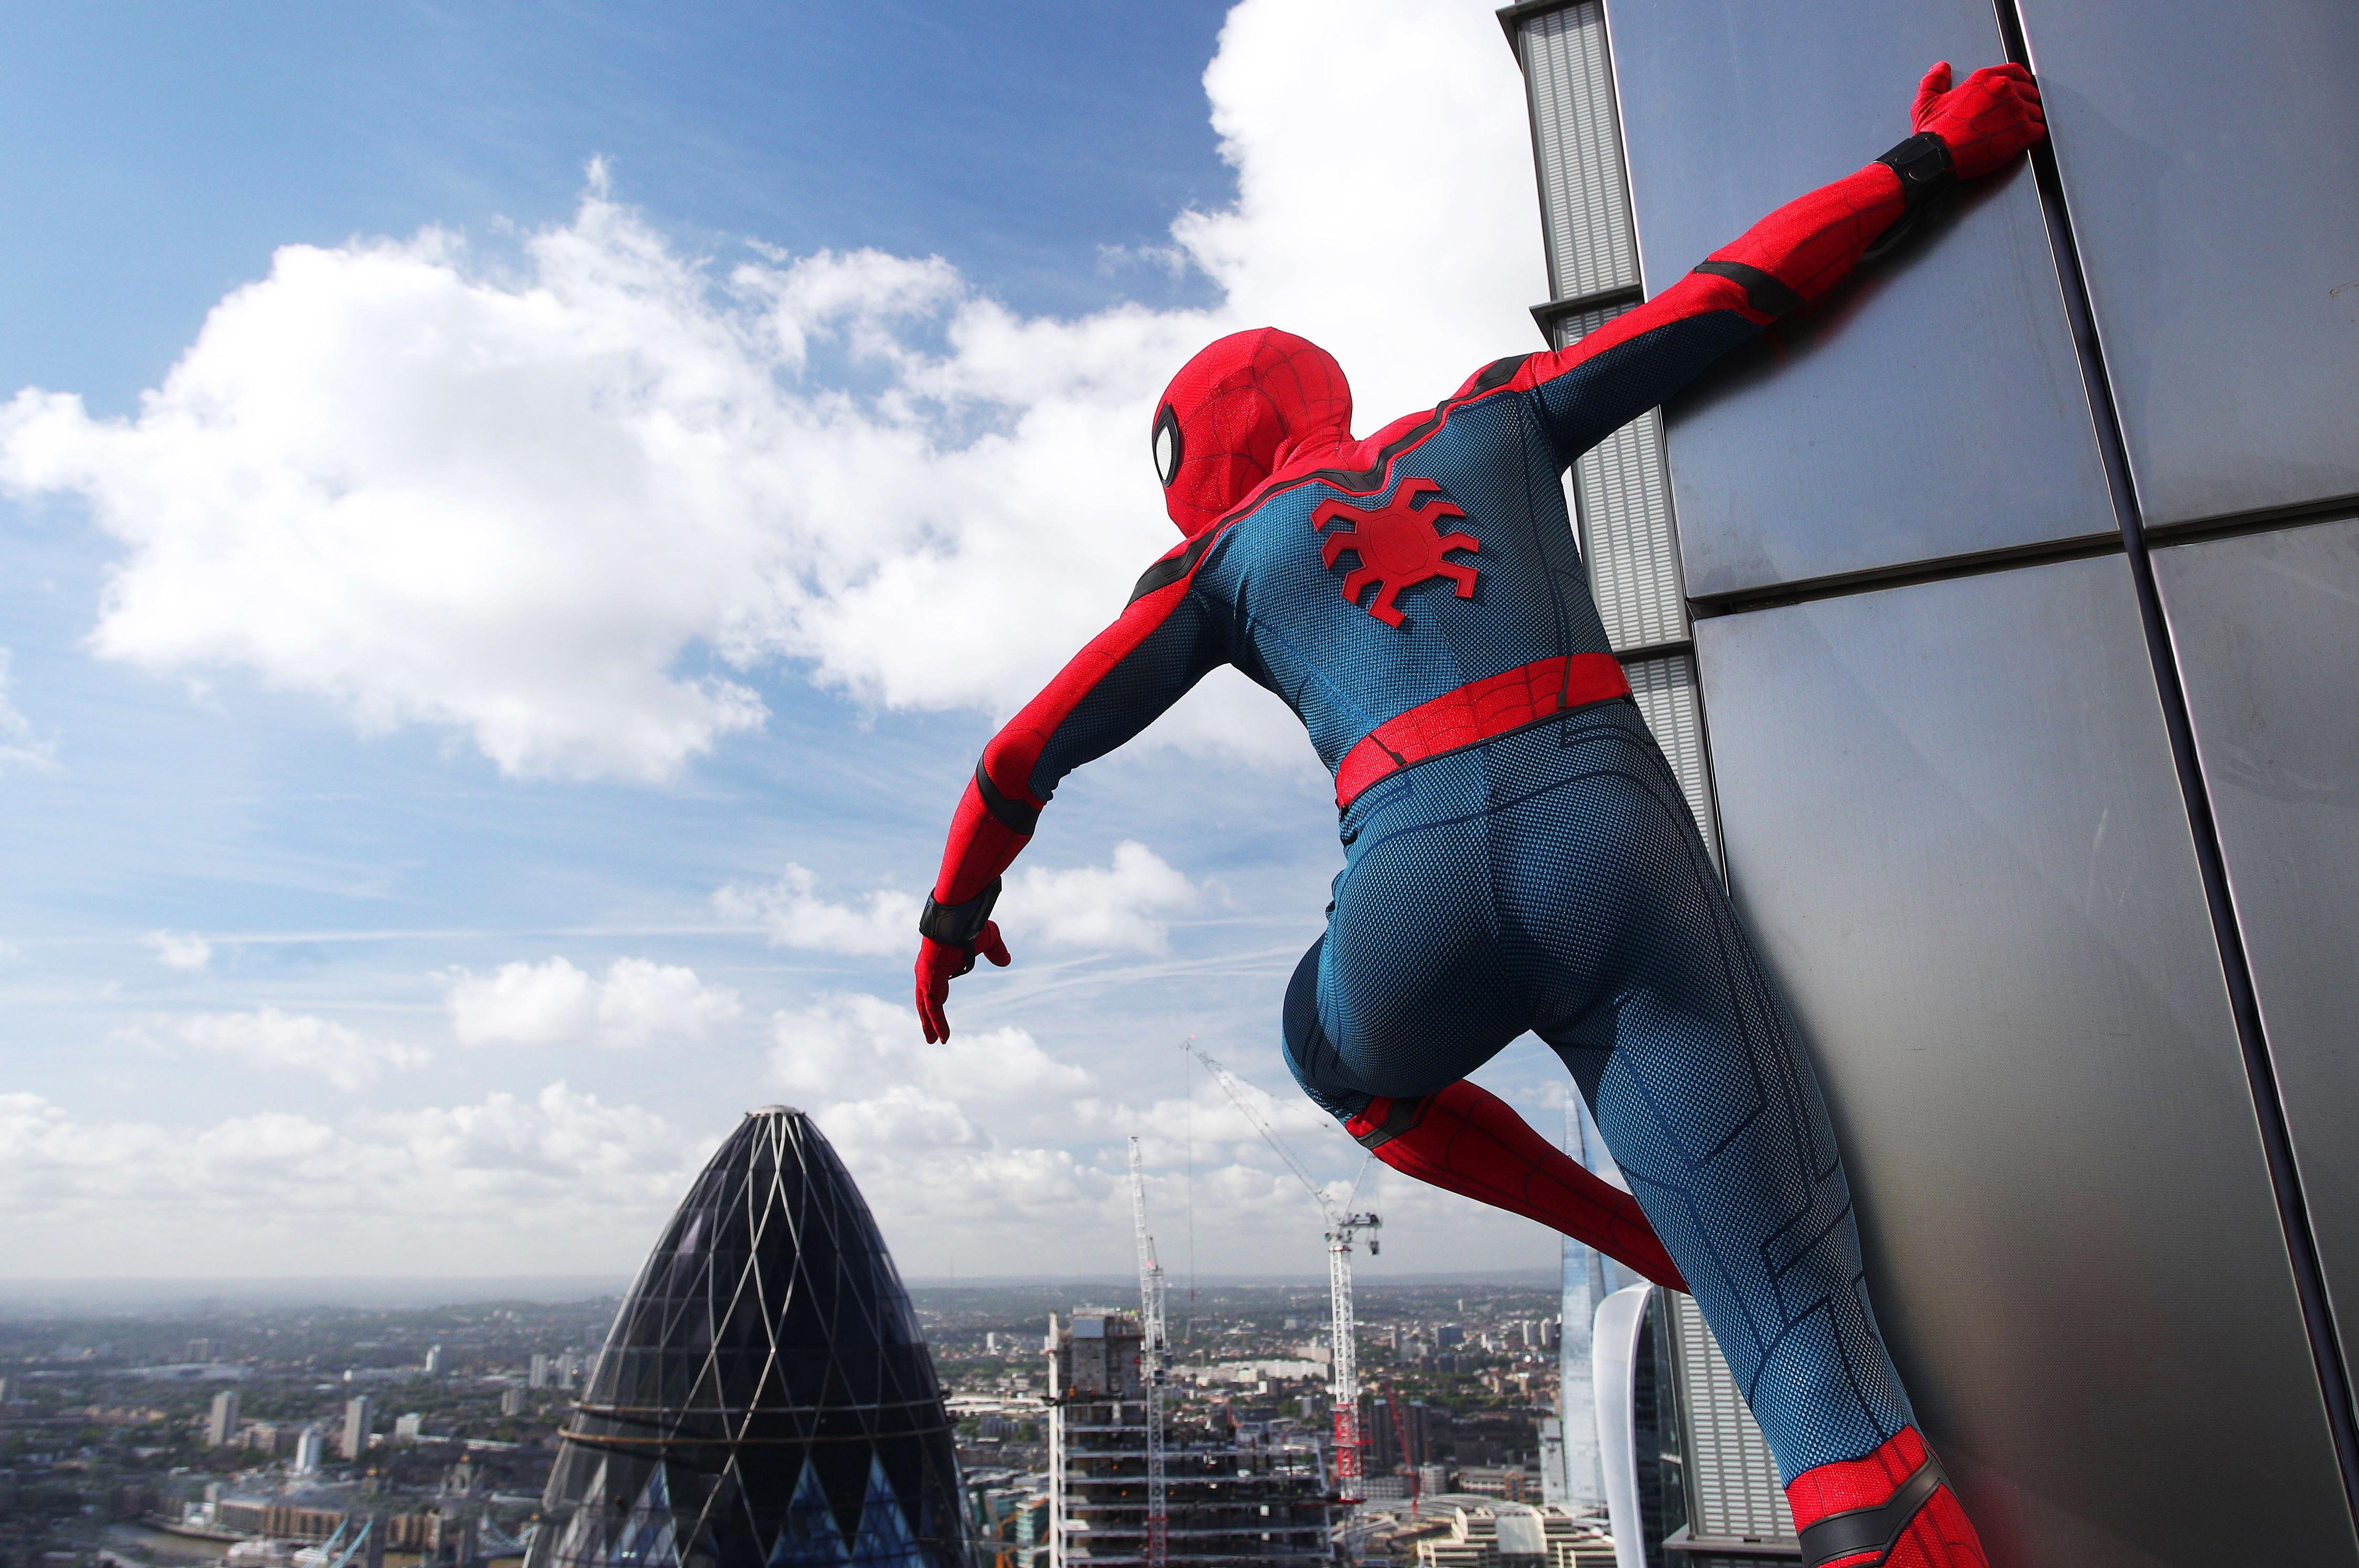 Spiderman Homecoming Movie 2017 4k, HD Movies, 4k ...